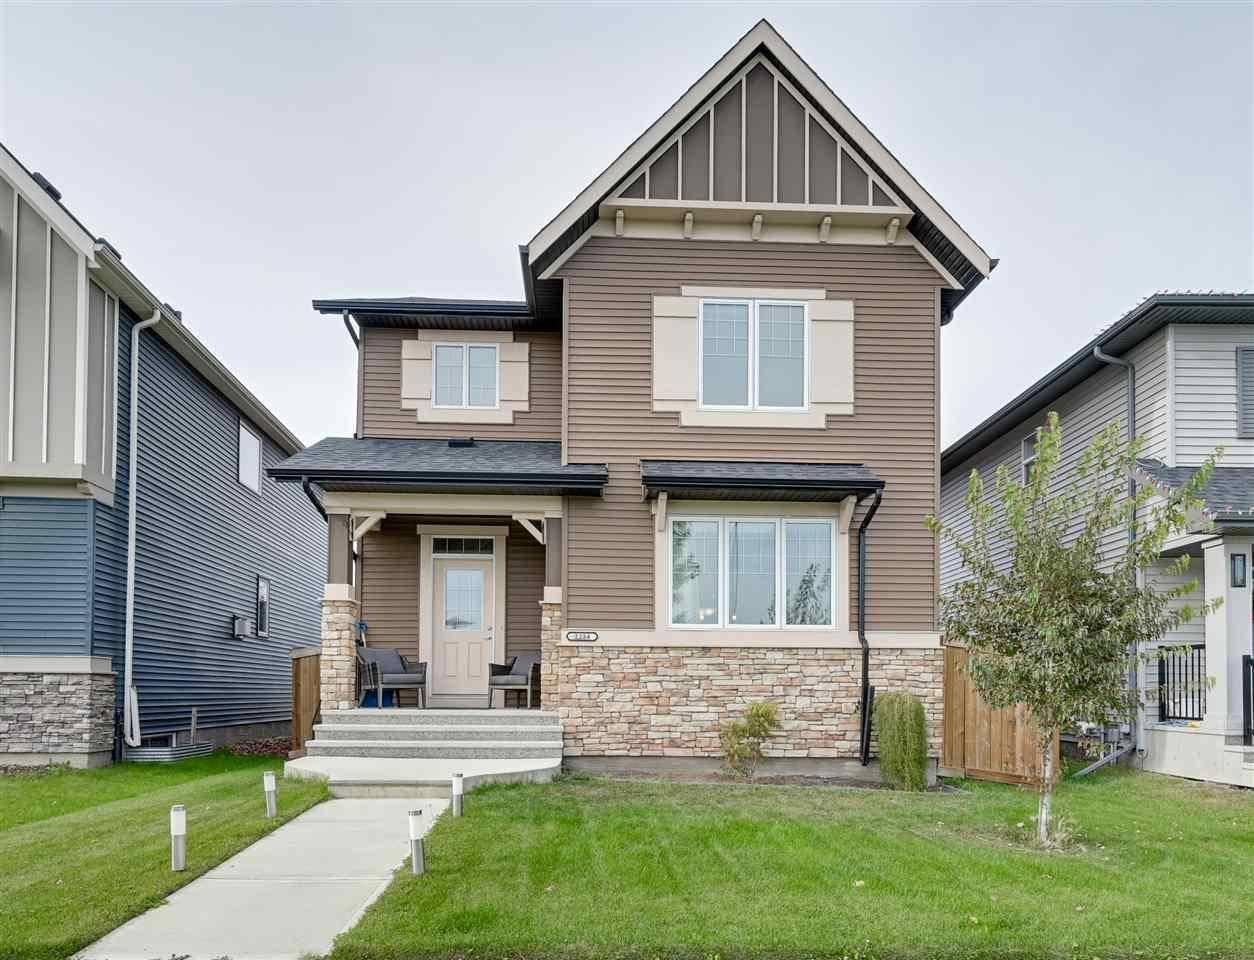 House for sale at 2234 Aspen Tr Sherwood Park Alberta - MLS: E4189310